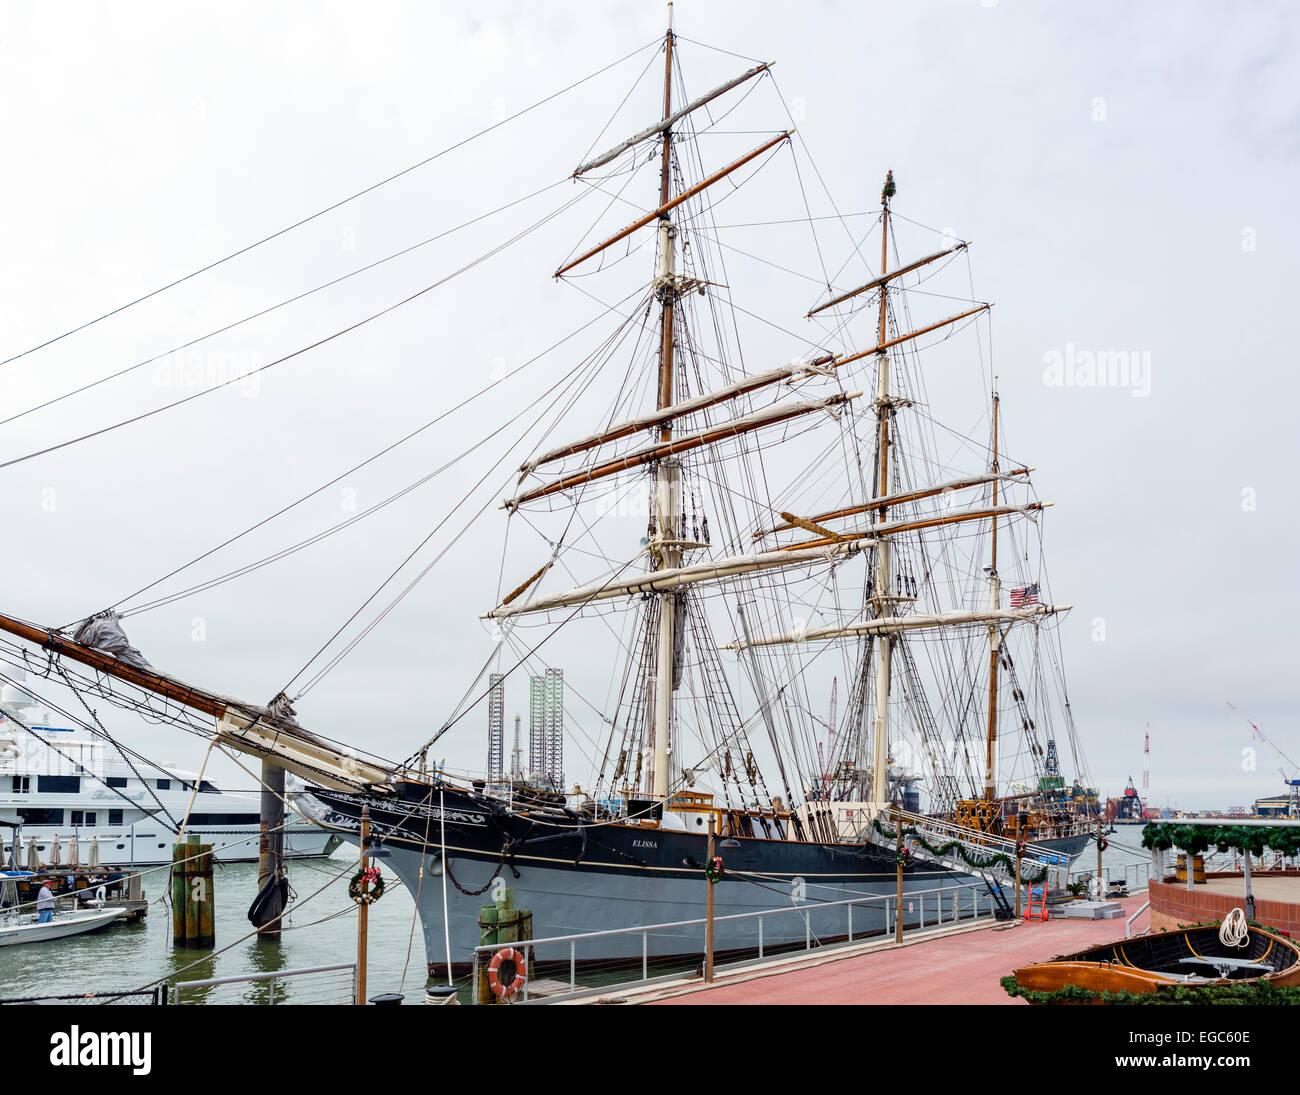 The historic tall ship Elissa at the Texas Seaport Museum, Strand Landmark Historic District, Galveston, Texas, Stock Photo